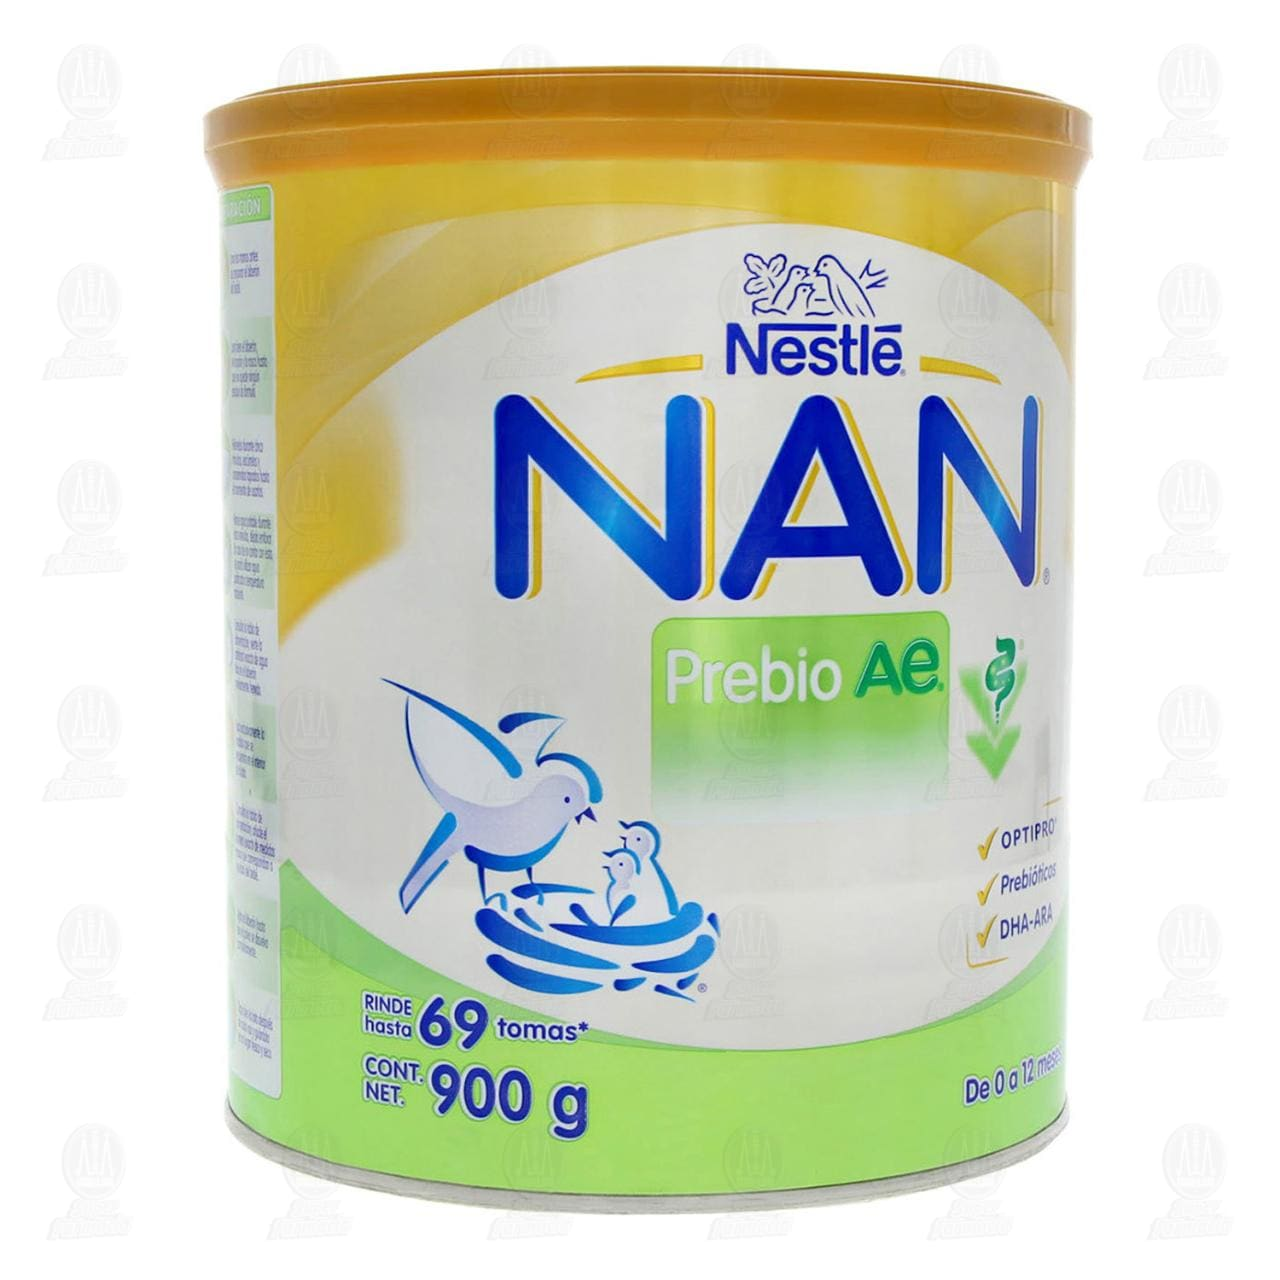 Fórmula Infantil Nestlé Nan Prebio Ae en Polvo (Edad 0-12 Meses), 900 gr.